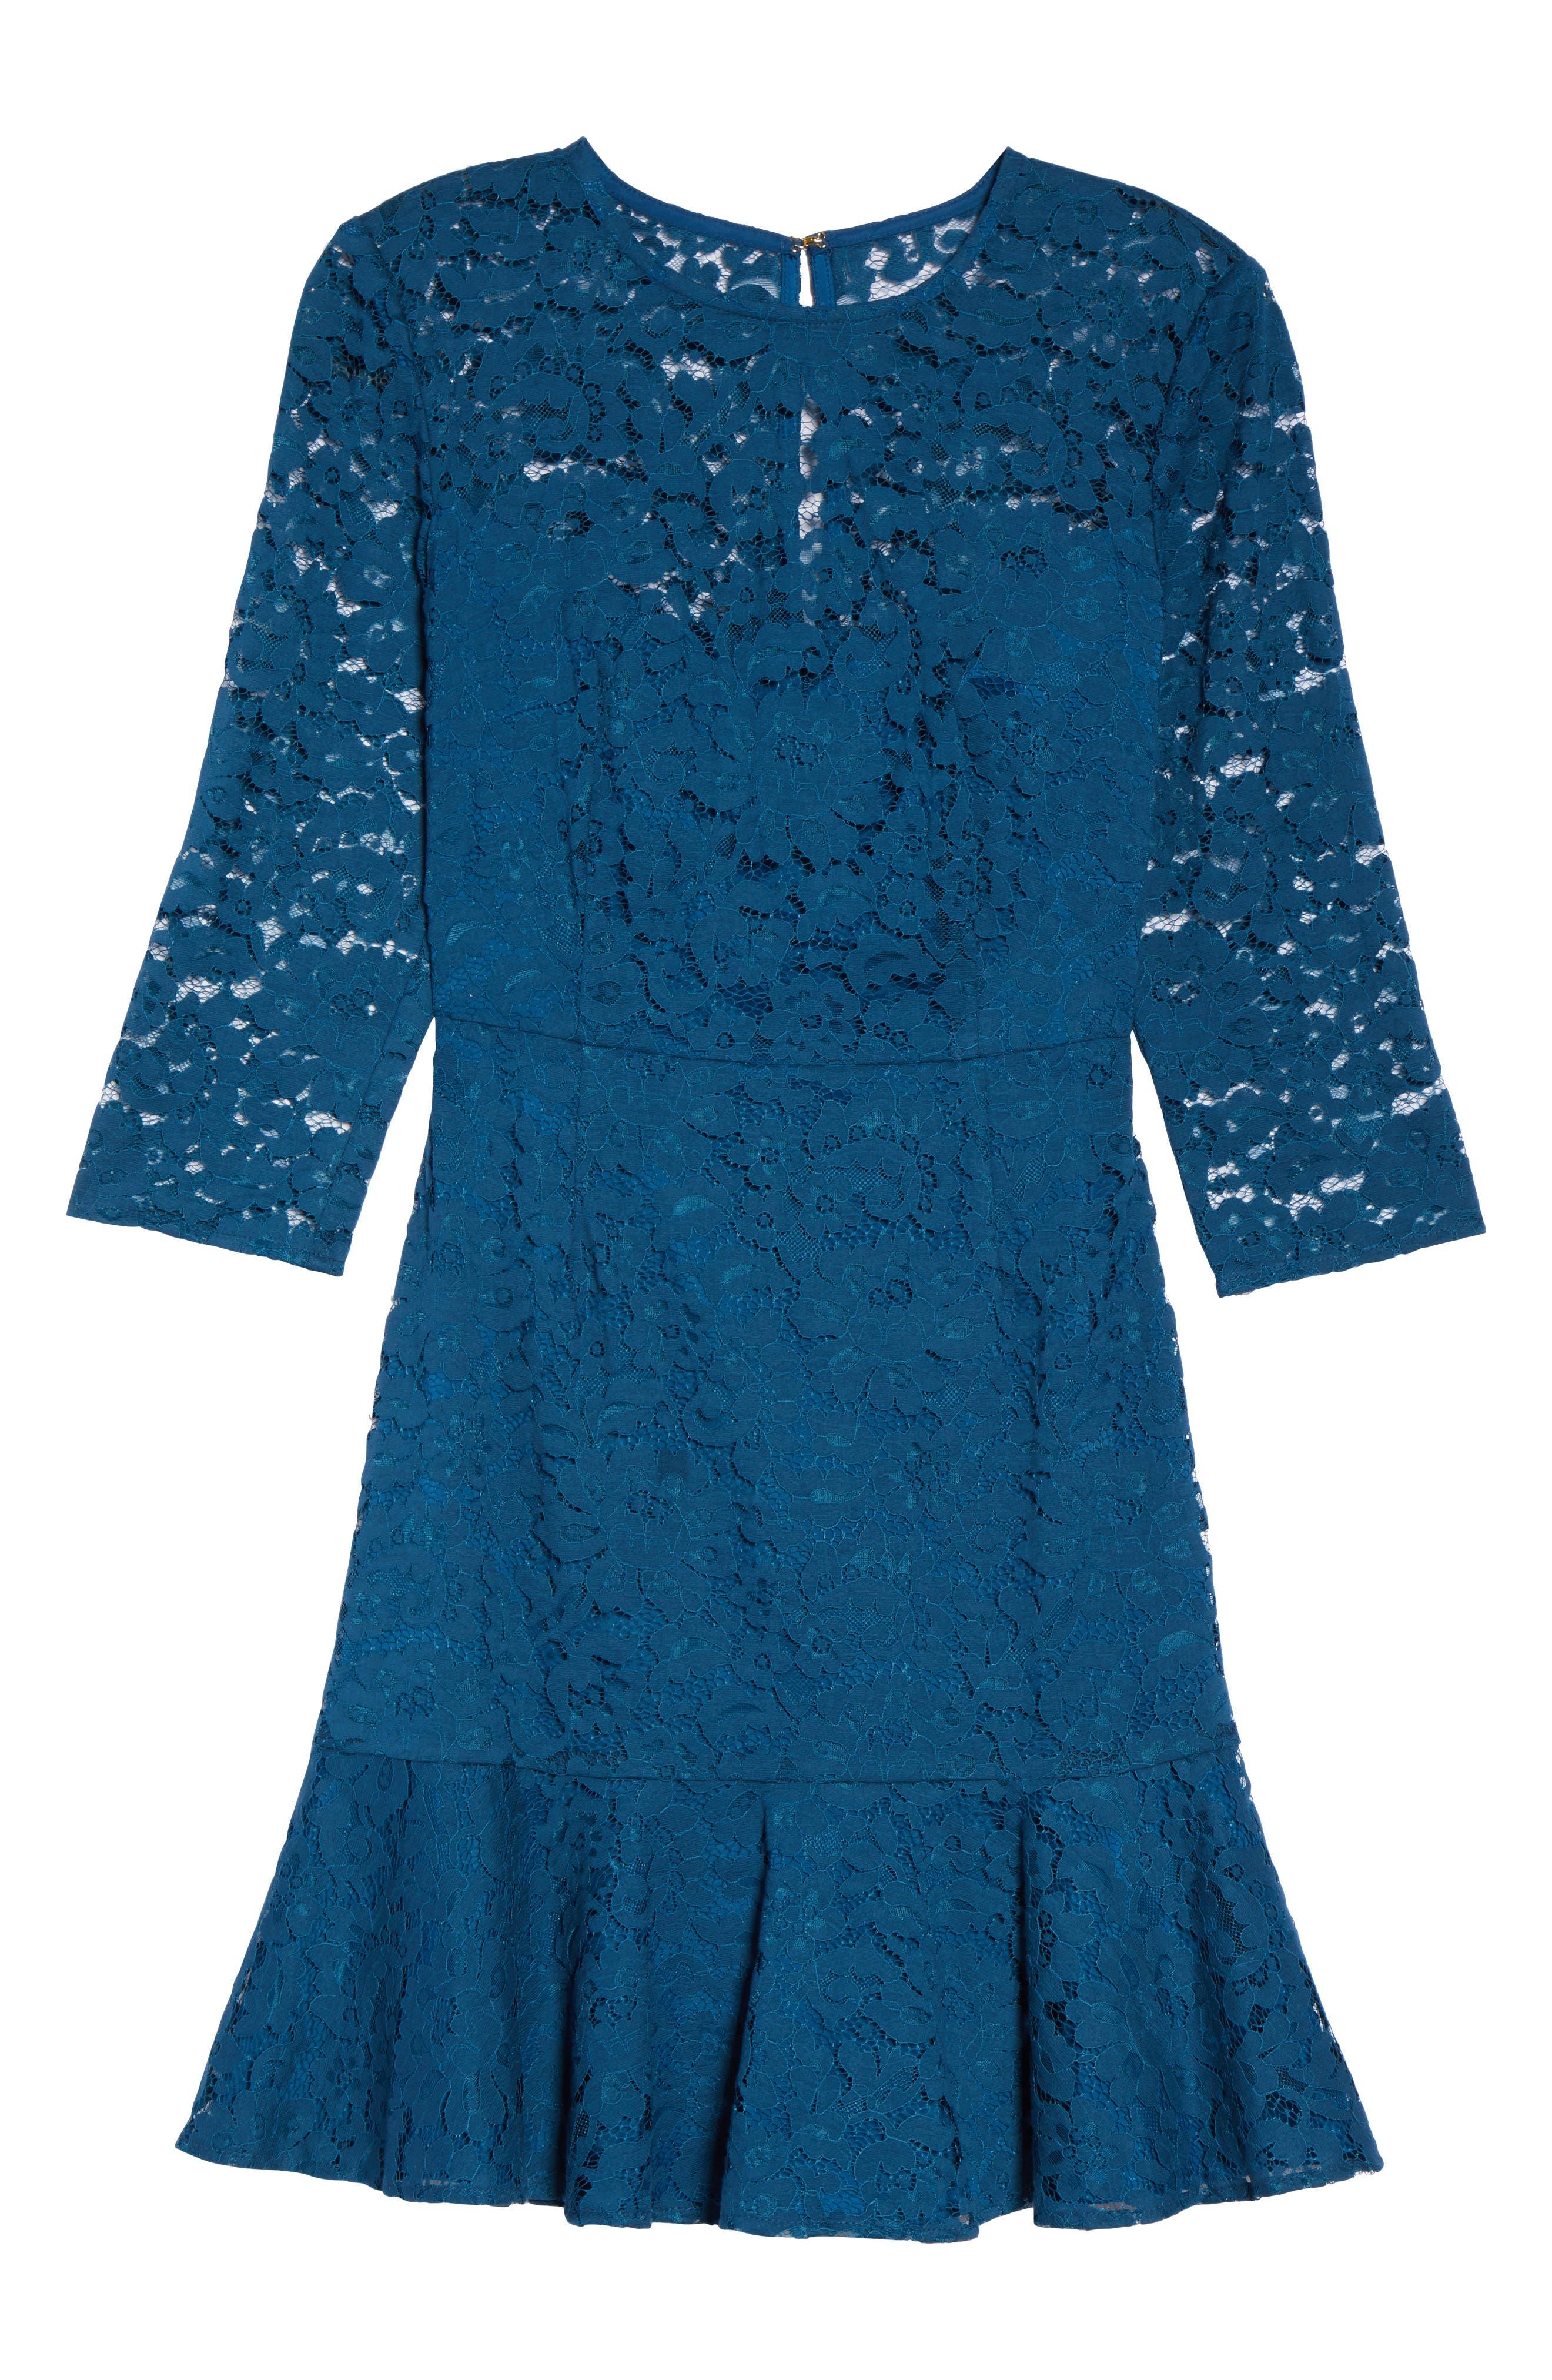 Stanley Lace Fit & Flare Dress,                             Alternate thumbnail 6, color,                             412